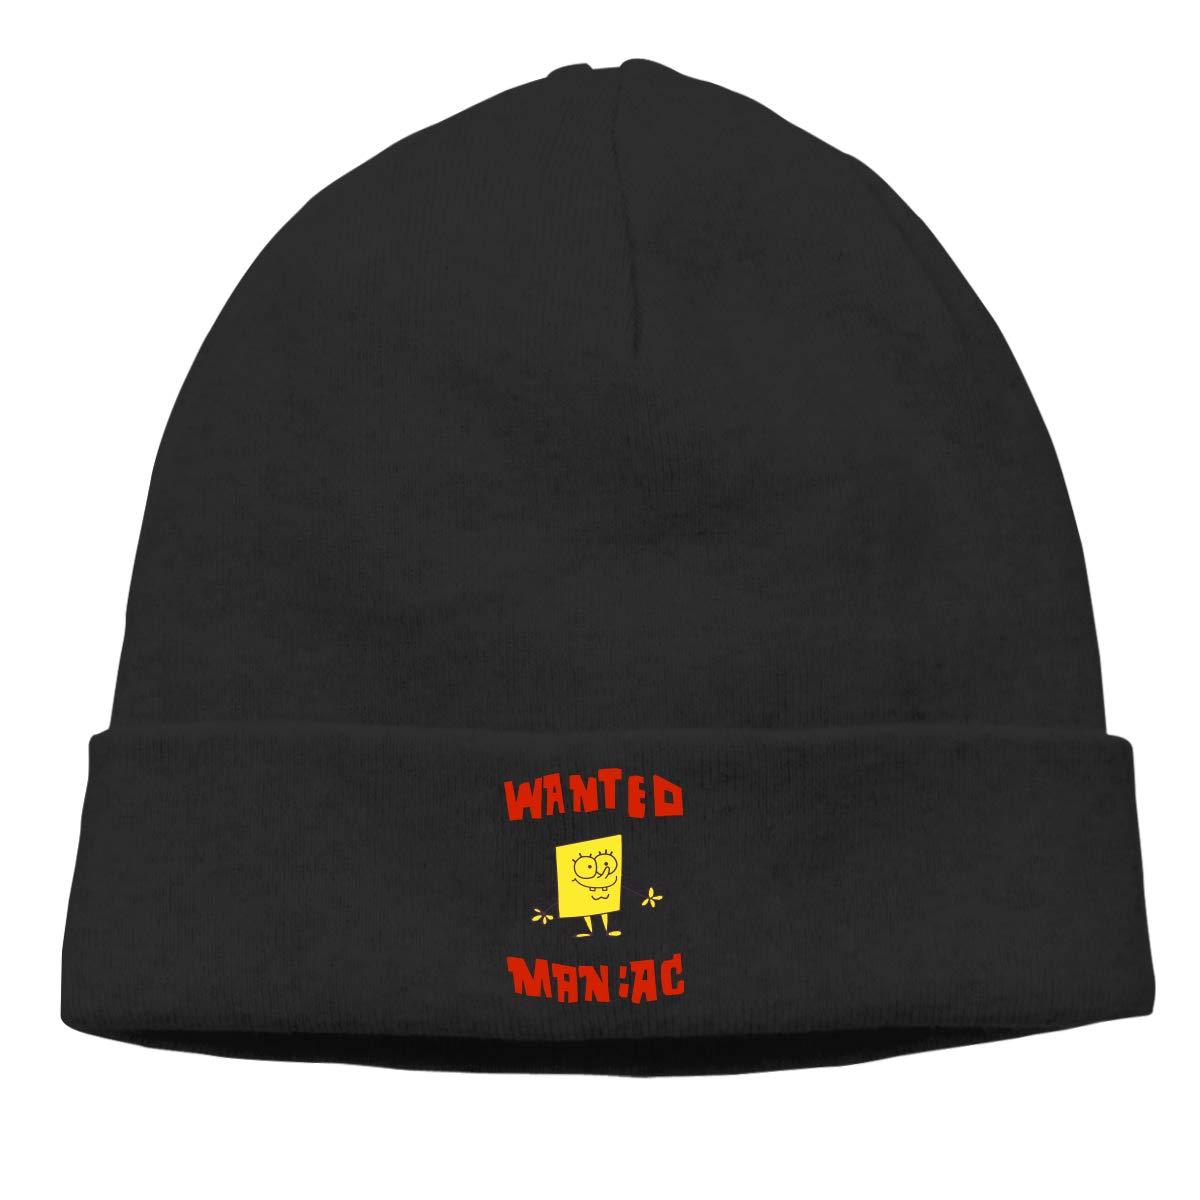 04166fb28f2f1 Amazon.com  Spongebob Squarepants Unisex Winter Knitting Wool Warm Hat  Daily Slouchy Hats Beanie Skull Cap Black  Clothing